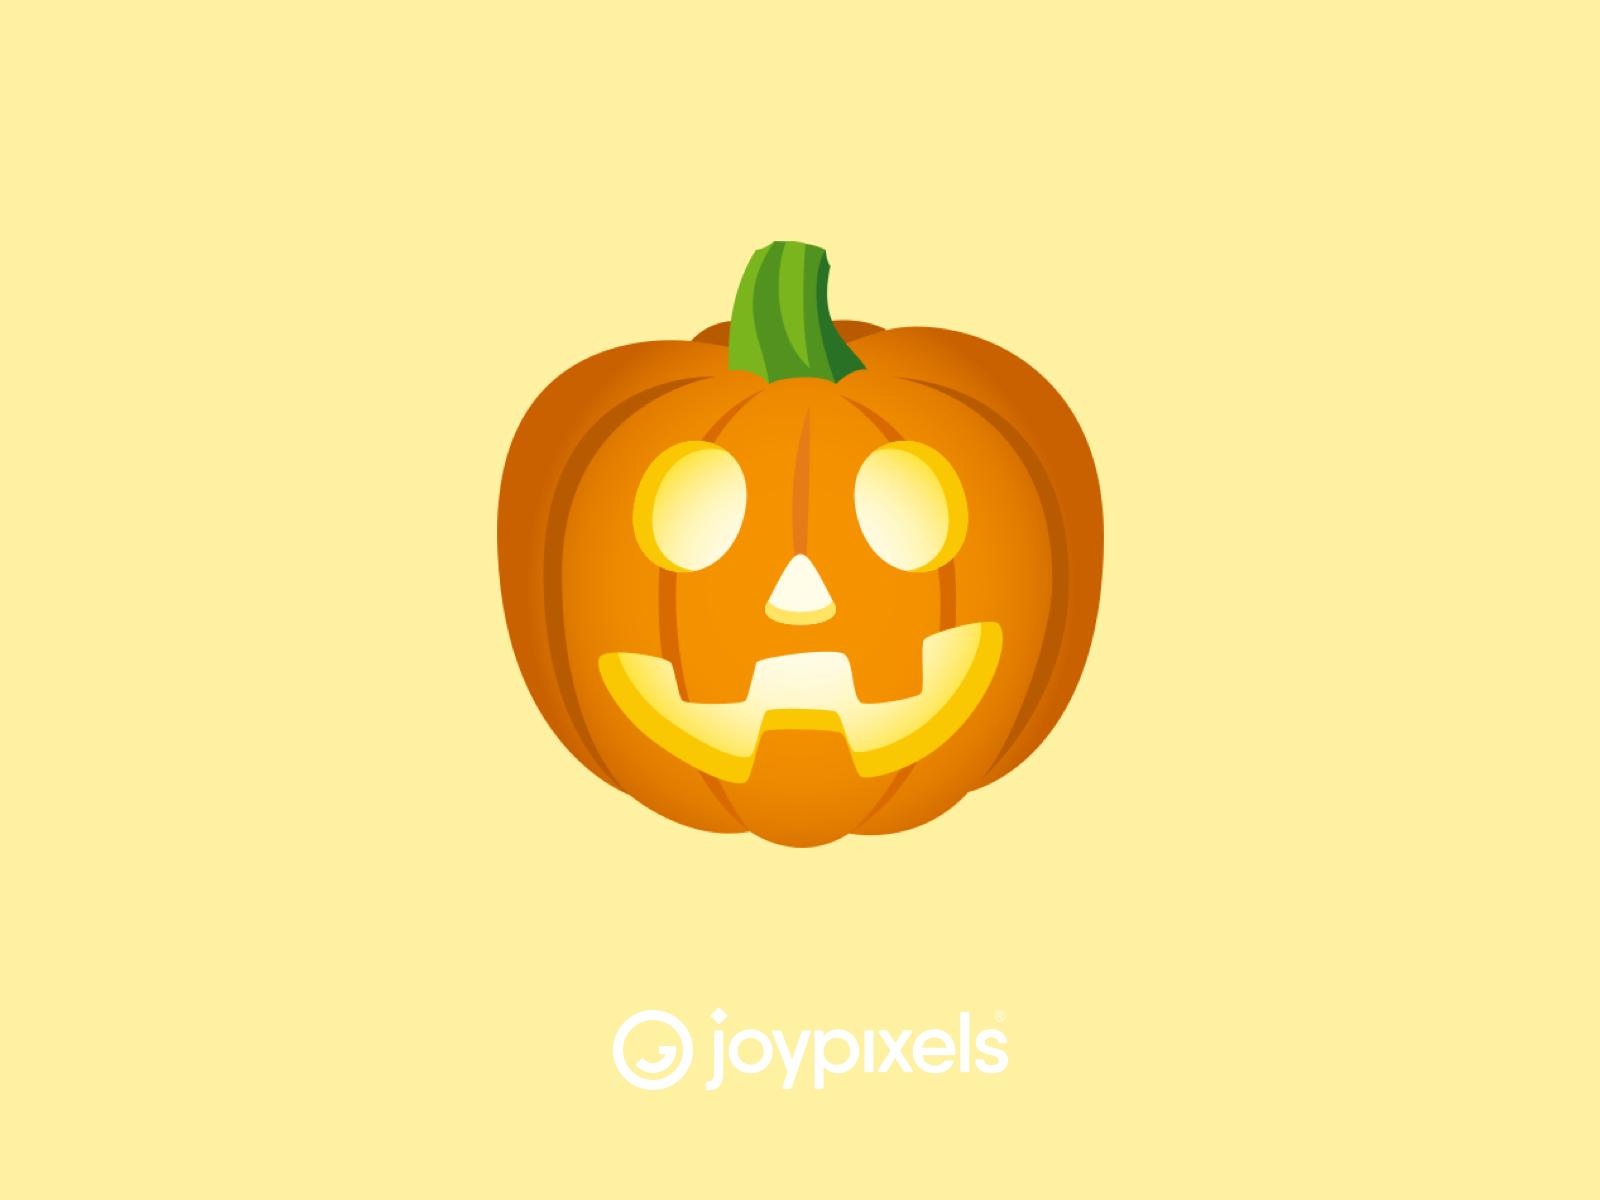 The Joypixels Jack O Lantern Emoji Version 5 0 By Joypixels On Dribbble